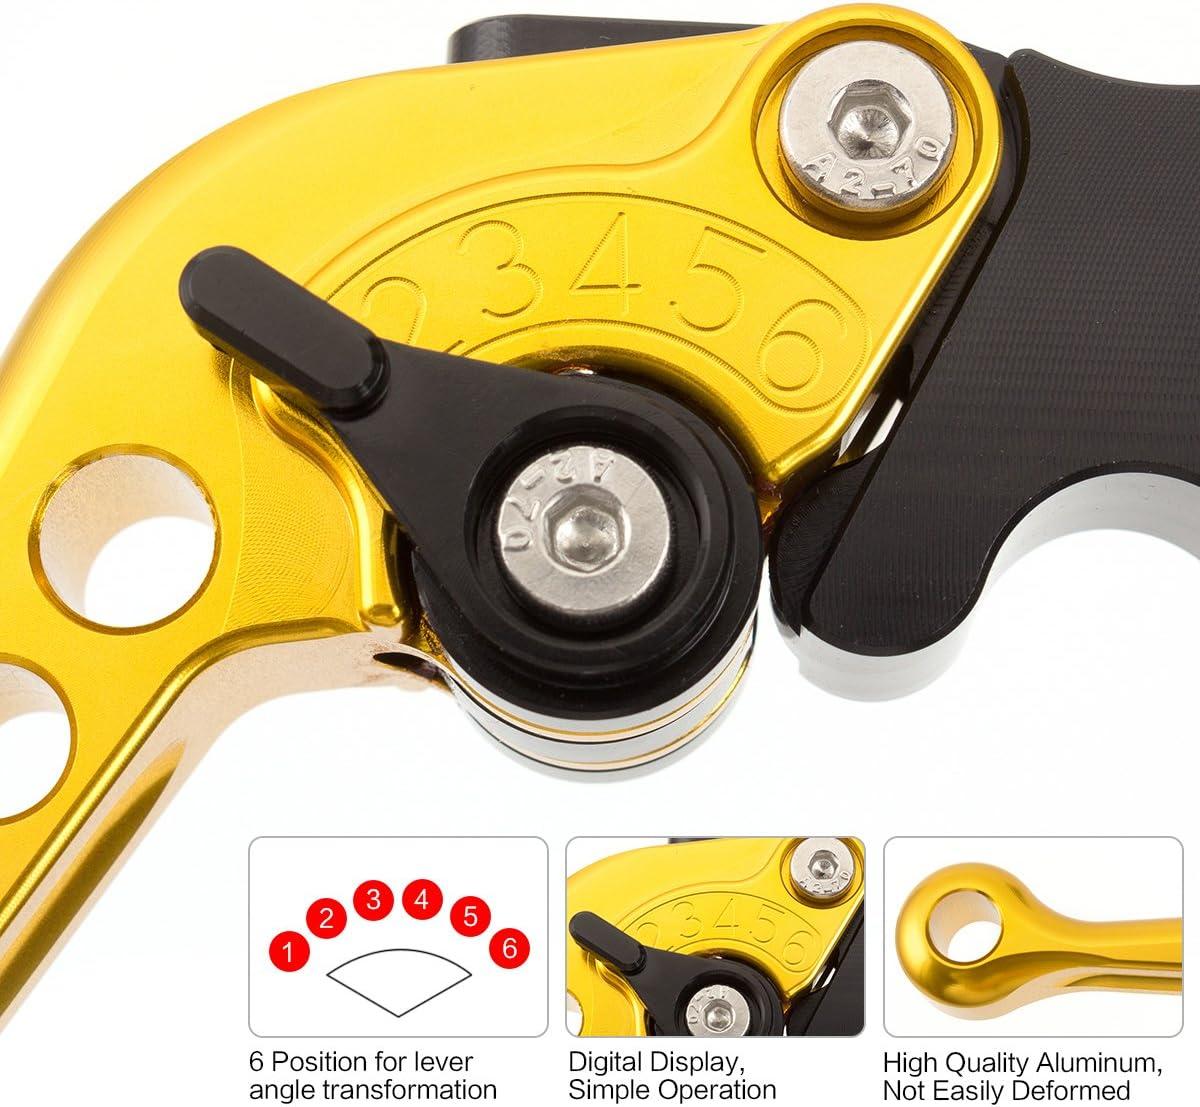 Motorrad-CNC-Kurzbremskupplungshebel 6 Positionen einstellbar f/ür Yamaha Warrior YFM 350 YFM350 2002-2004 Raptor YFM660 2001-2004 Gold mit Schwarz XT660 XT660R XT660X 2004-2013